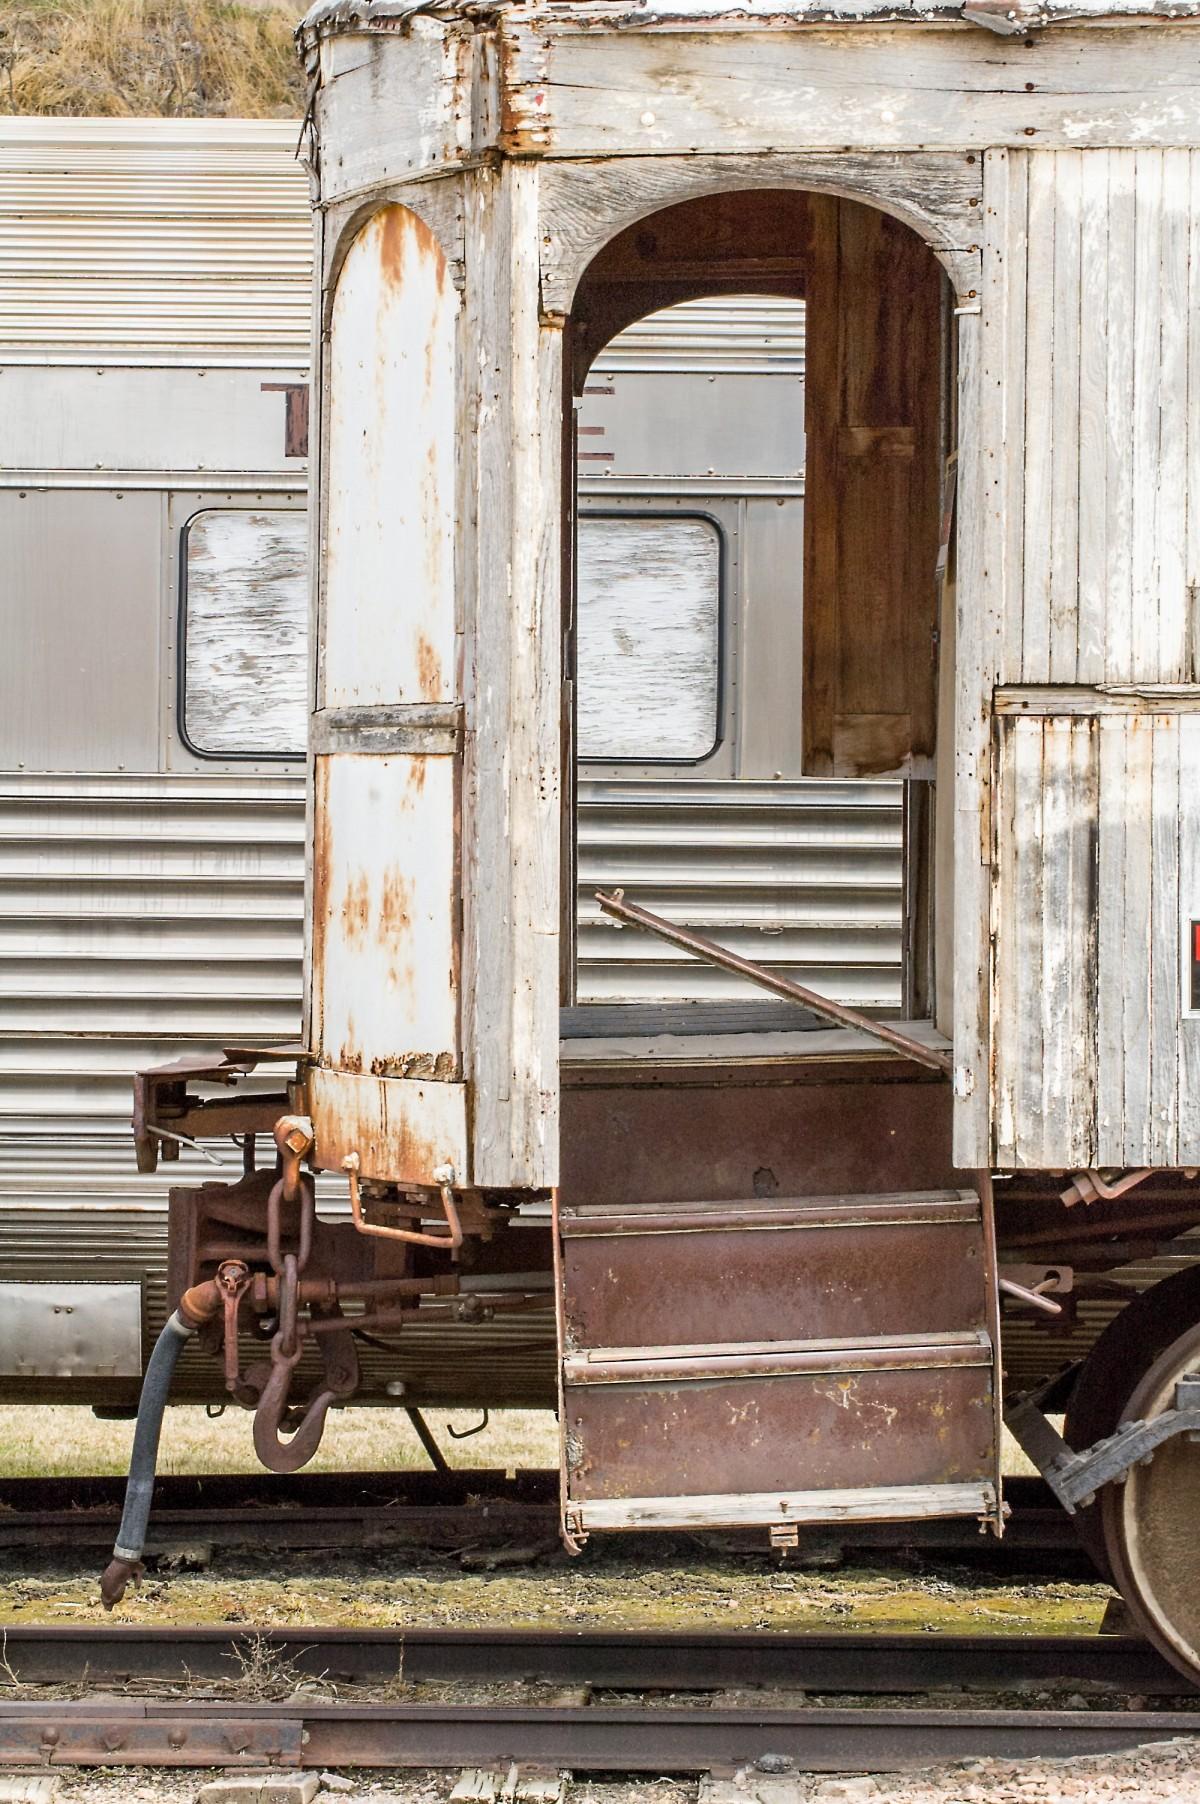 Free Images Track Railway Vintage Antique Wheel